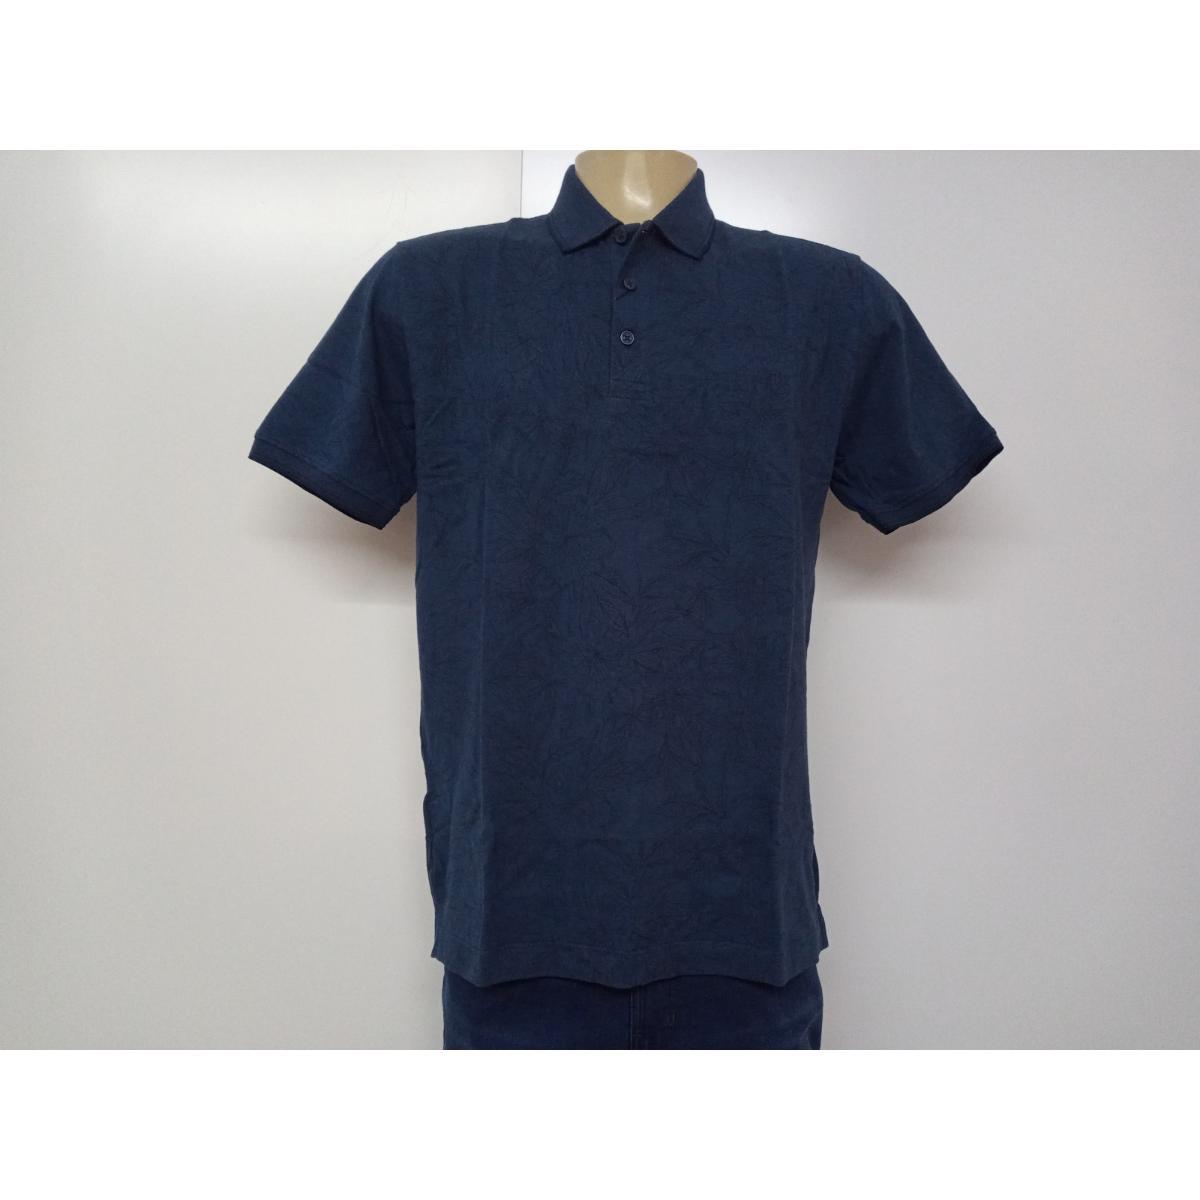 Camiseta Masculina Individual 08.75.0826.40 Estampado Azul Floral